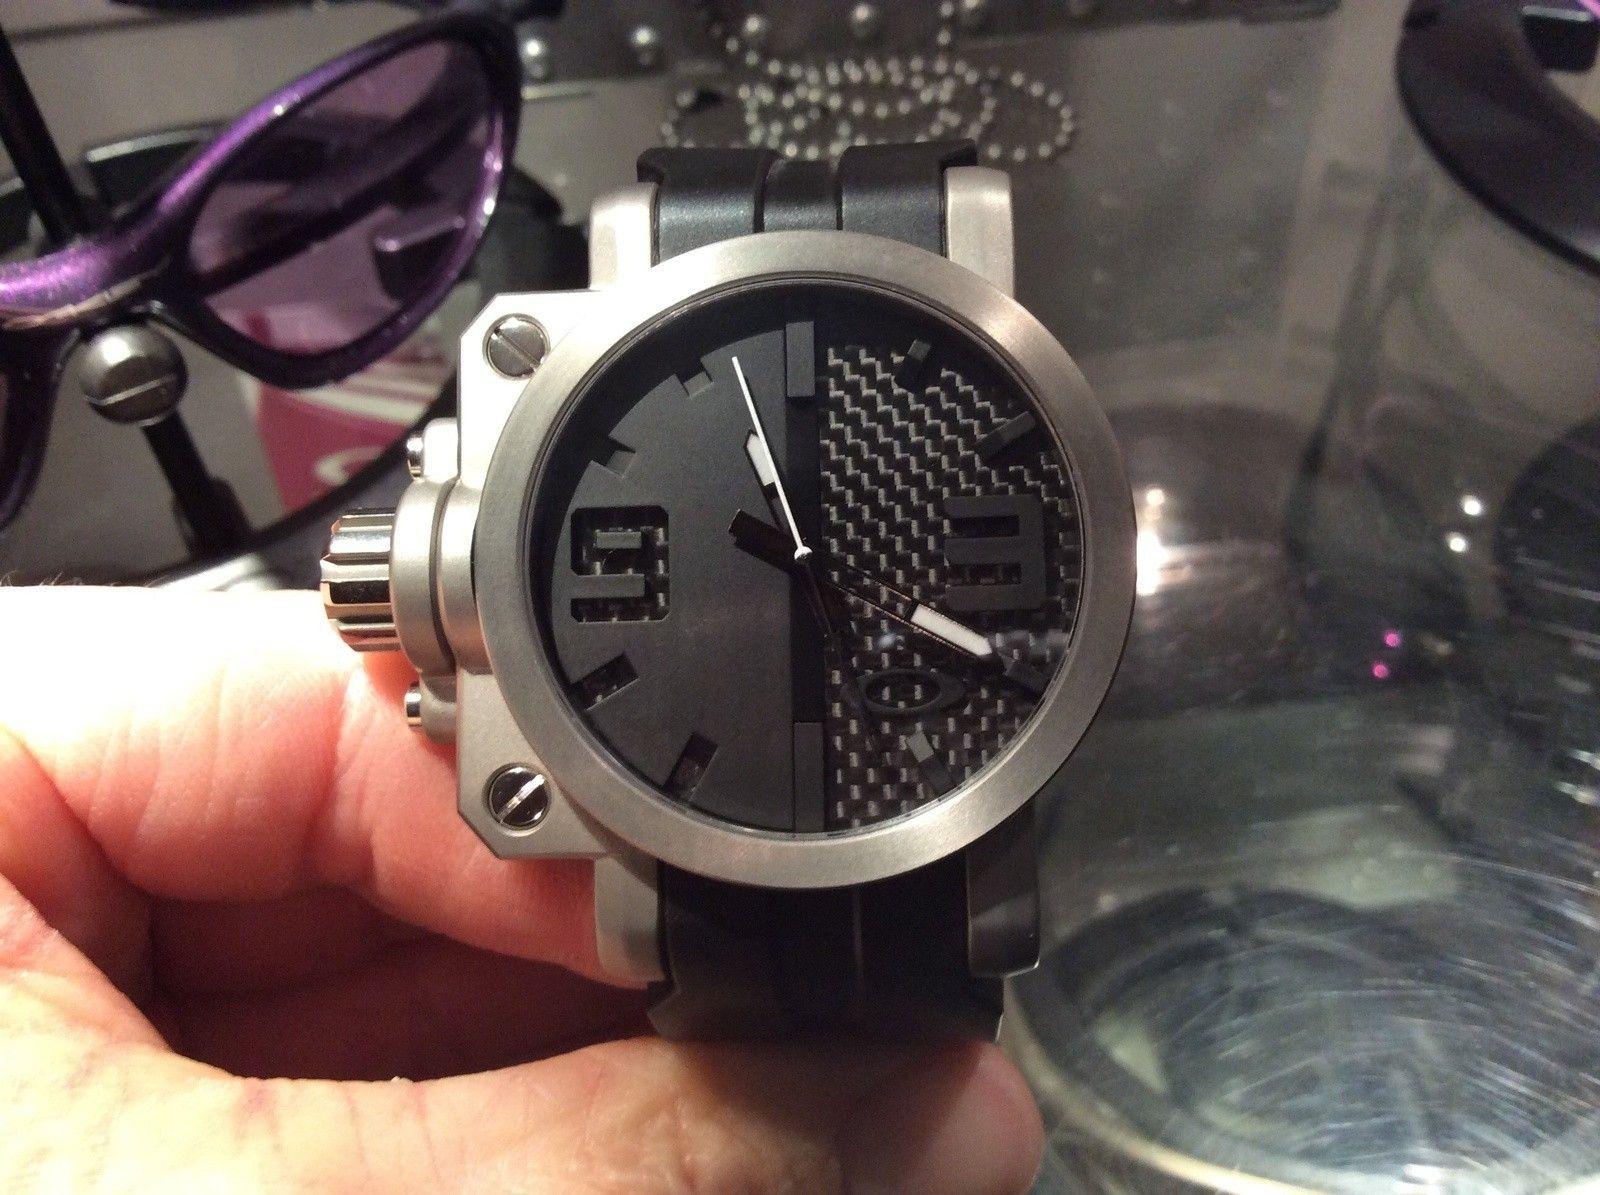 Gearbox Brushed Titanium SOLD - image.jpg